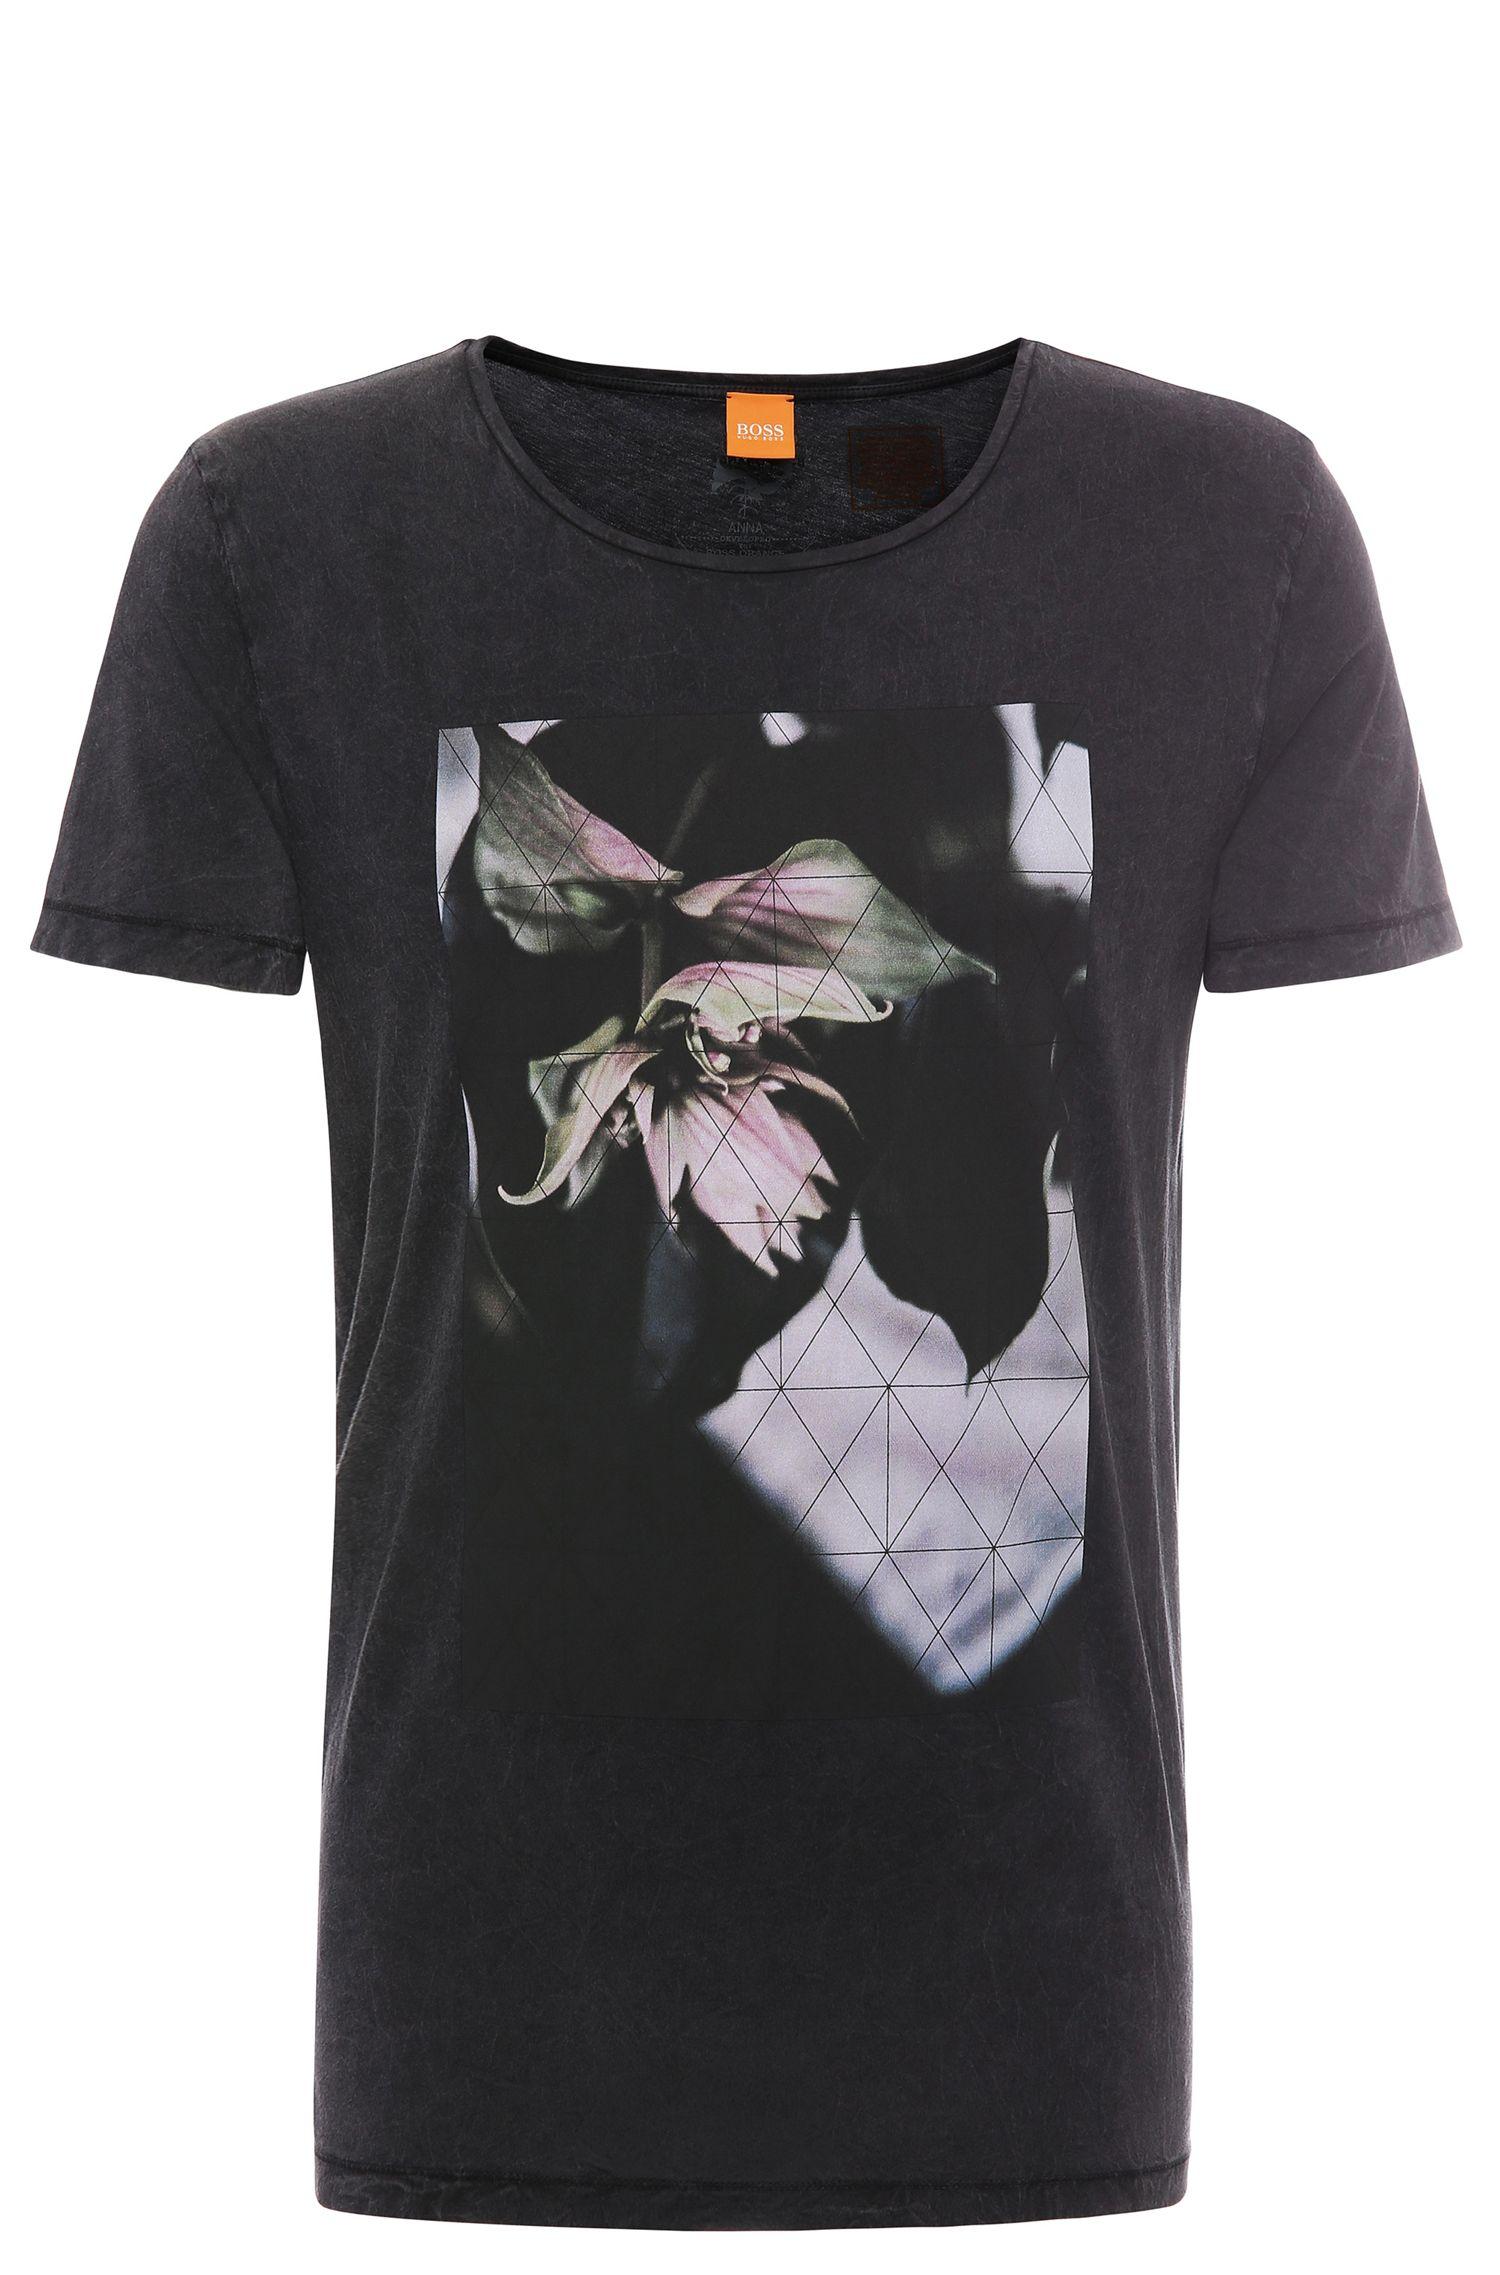 Relaxed-fit katoenen shirt met fotoprint: 'Torvind 1'